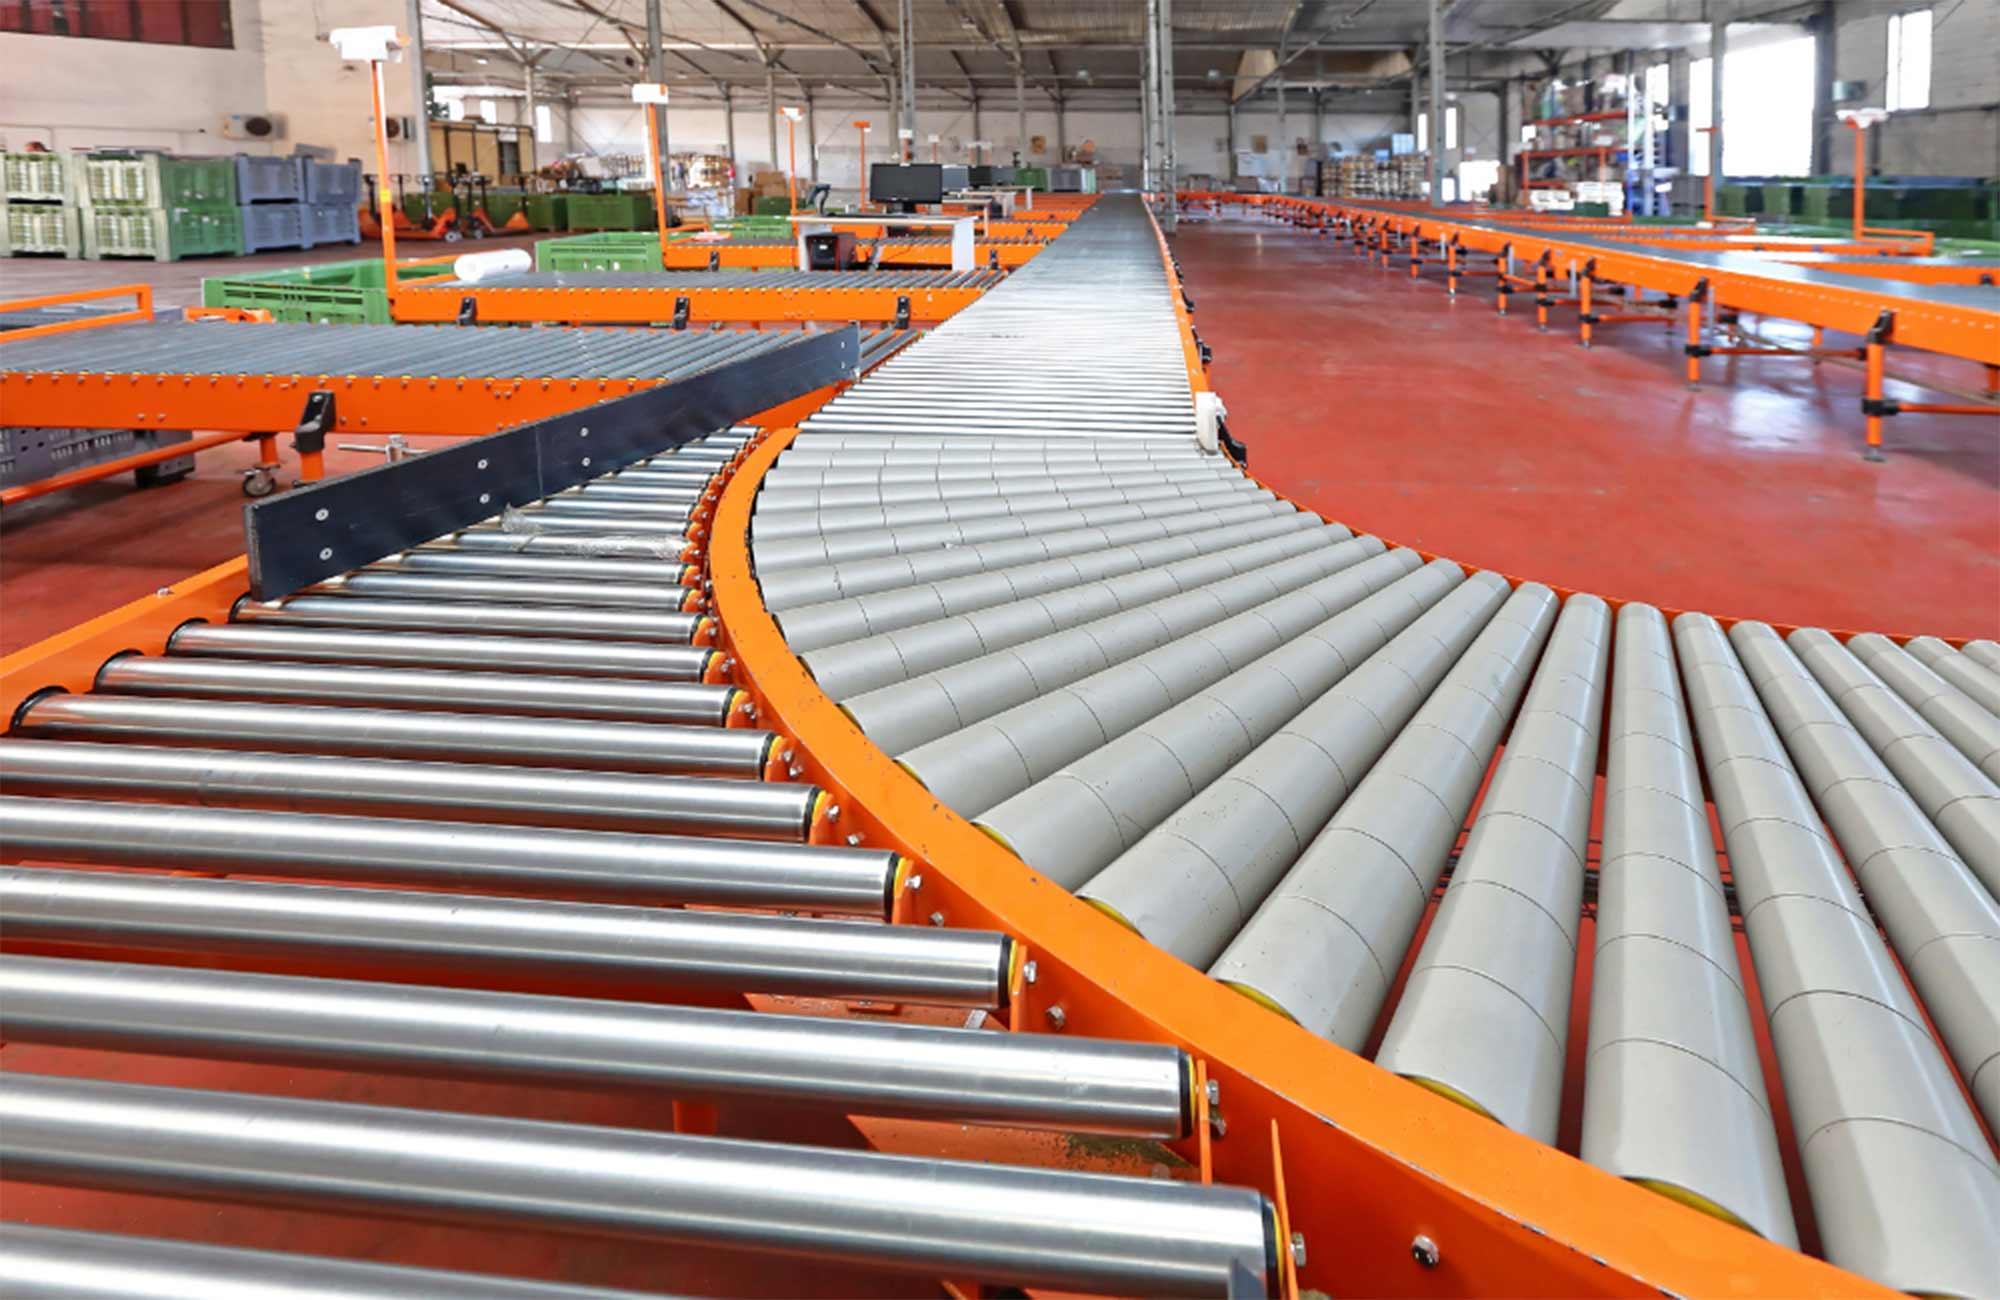 custom conveyors gauteng south africa_